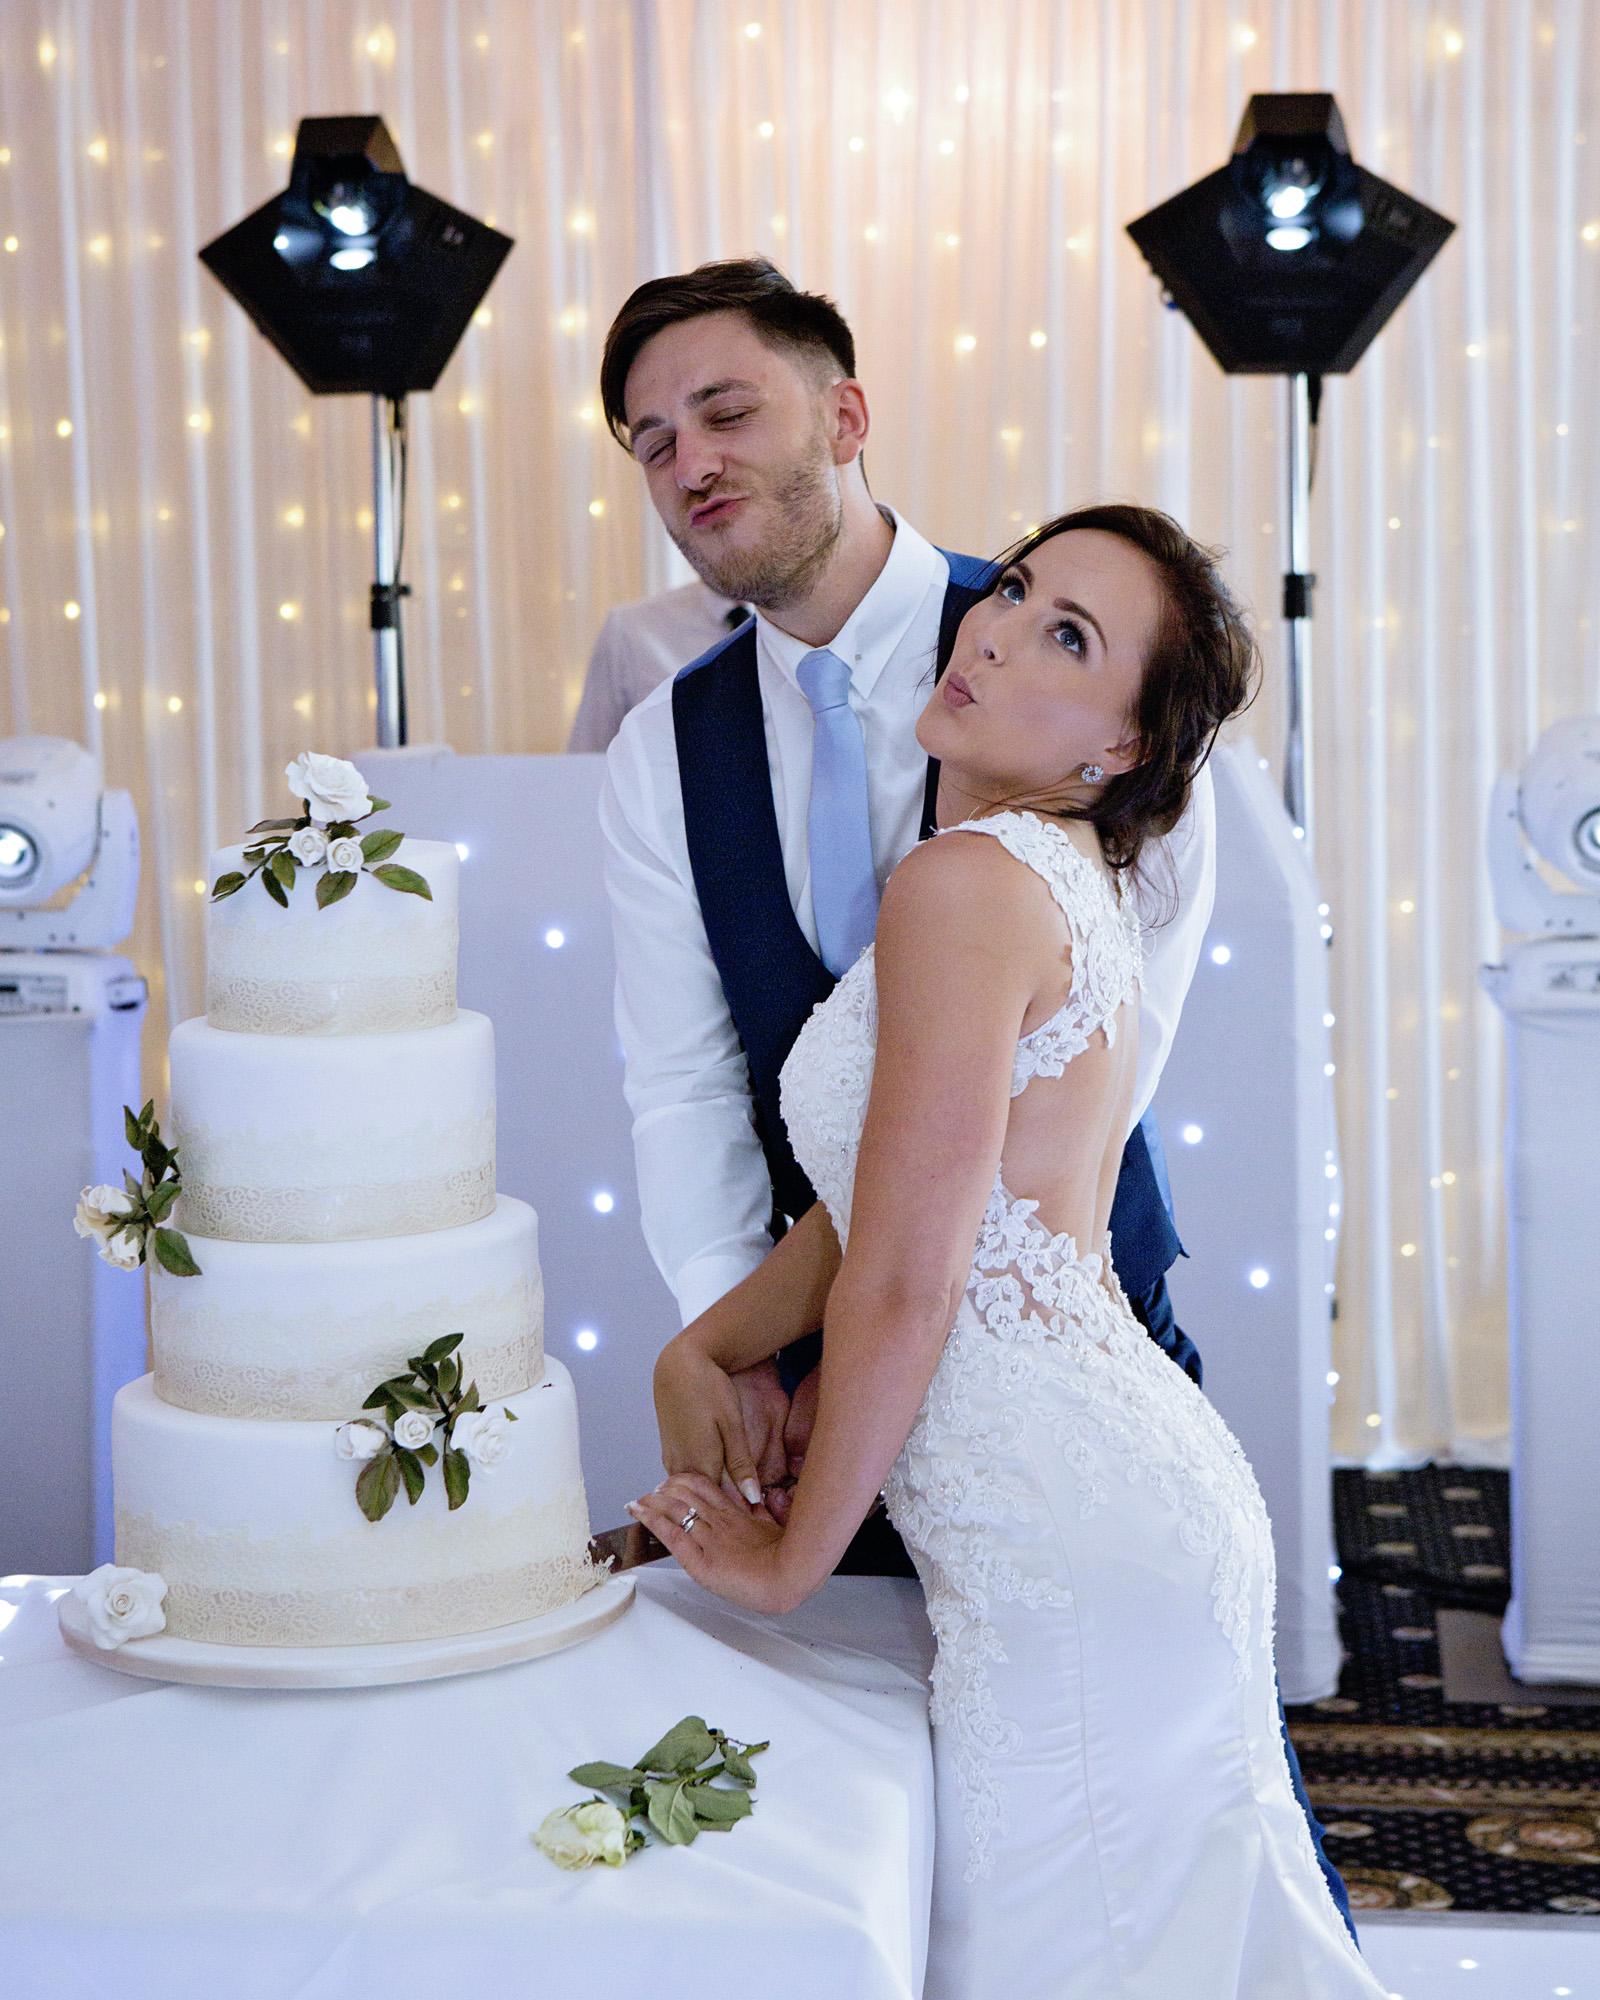 wedding-barnsdale-hall (43).jpg